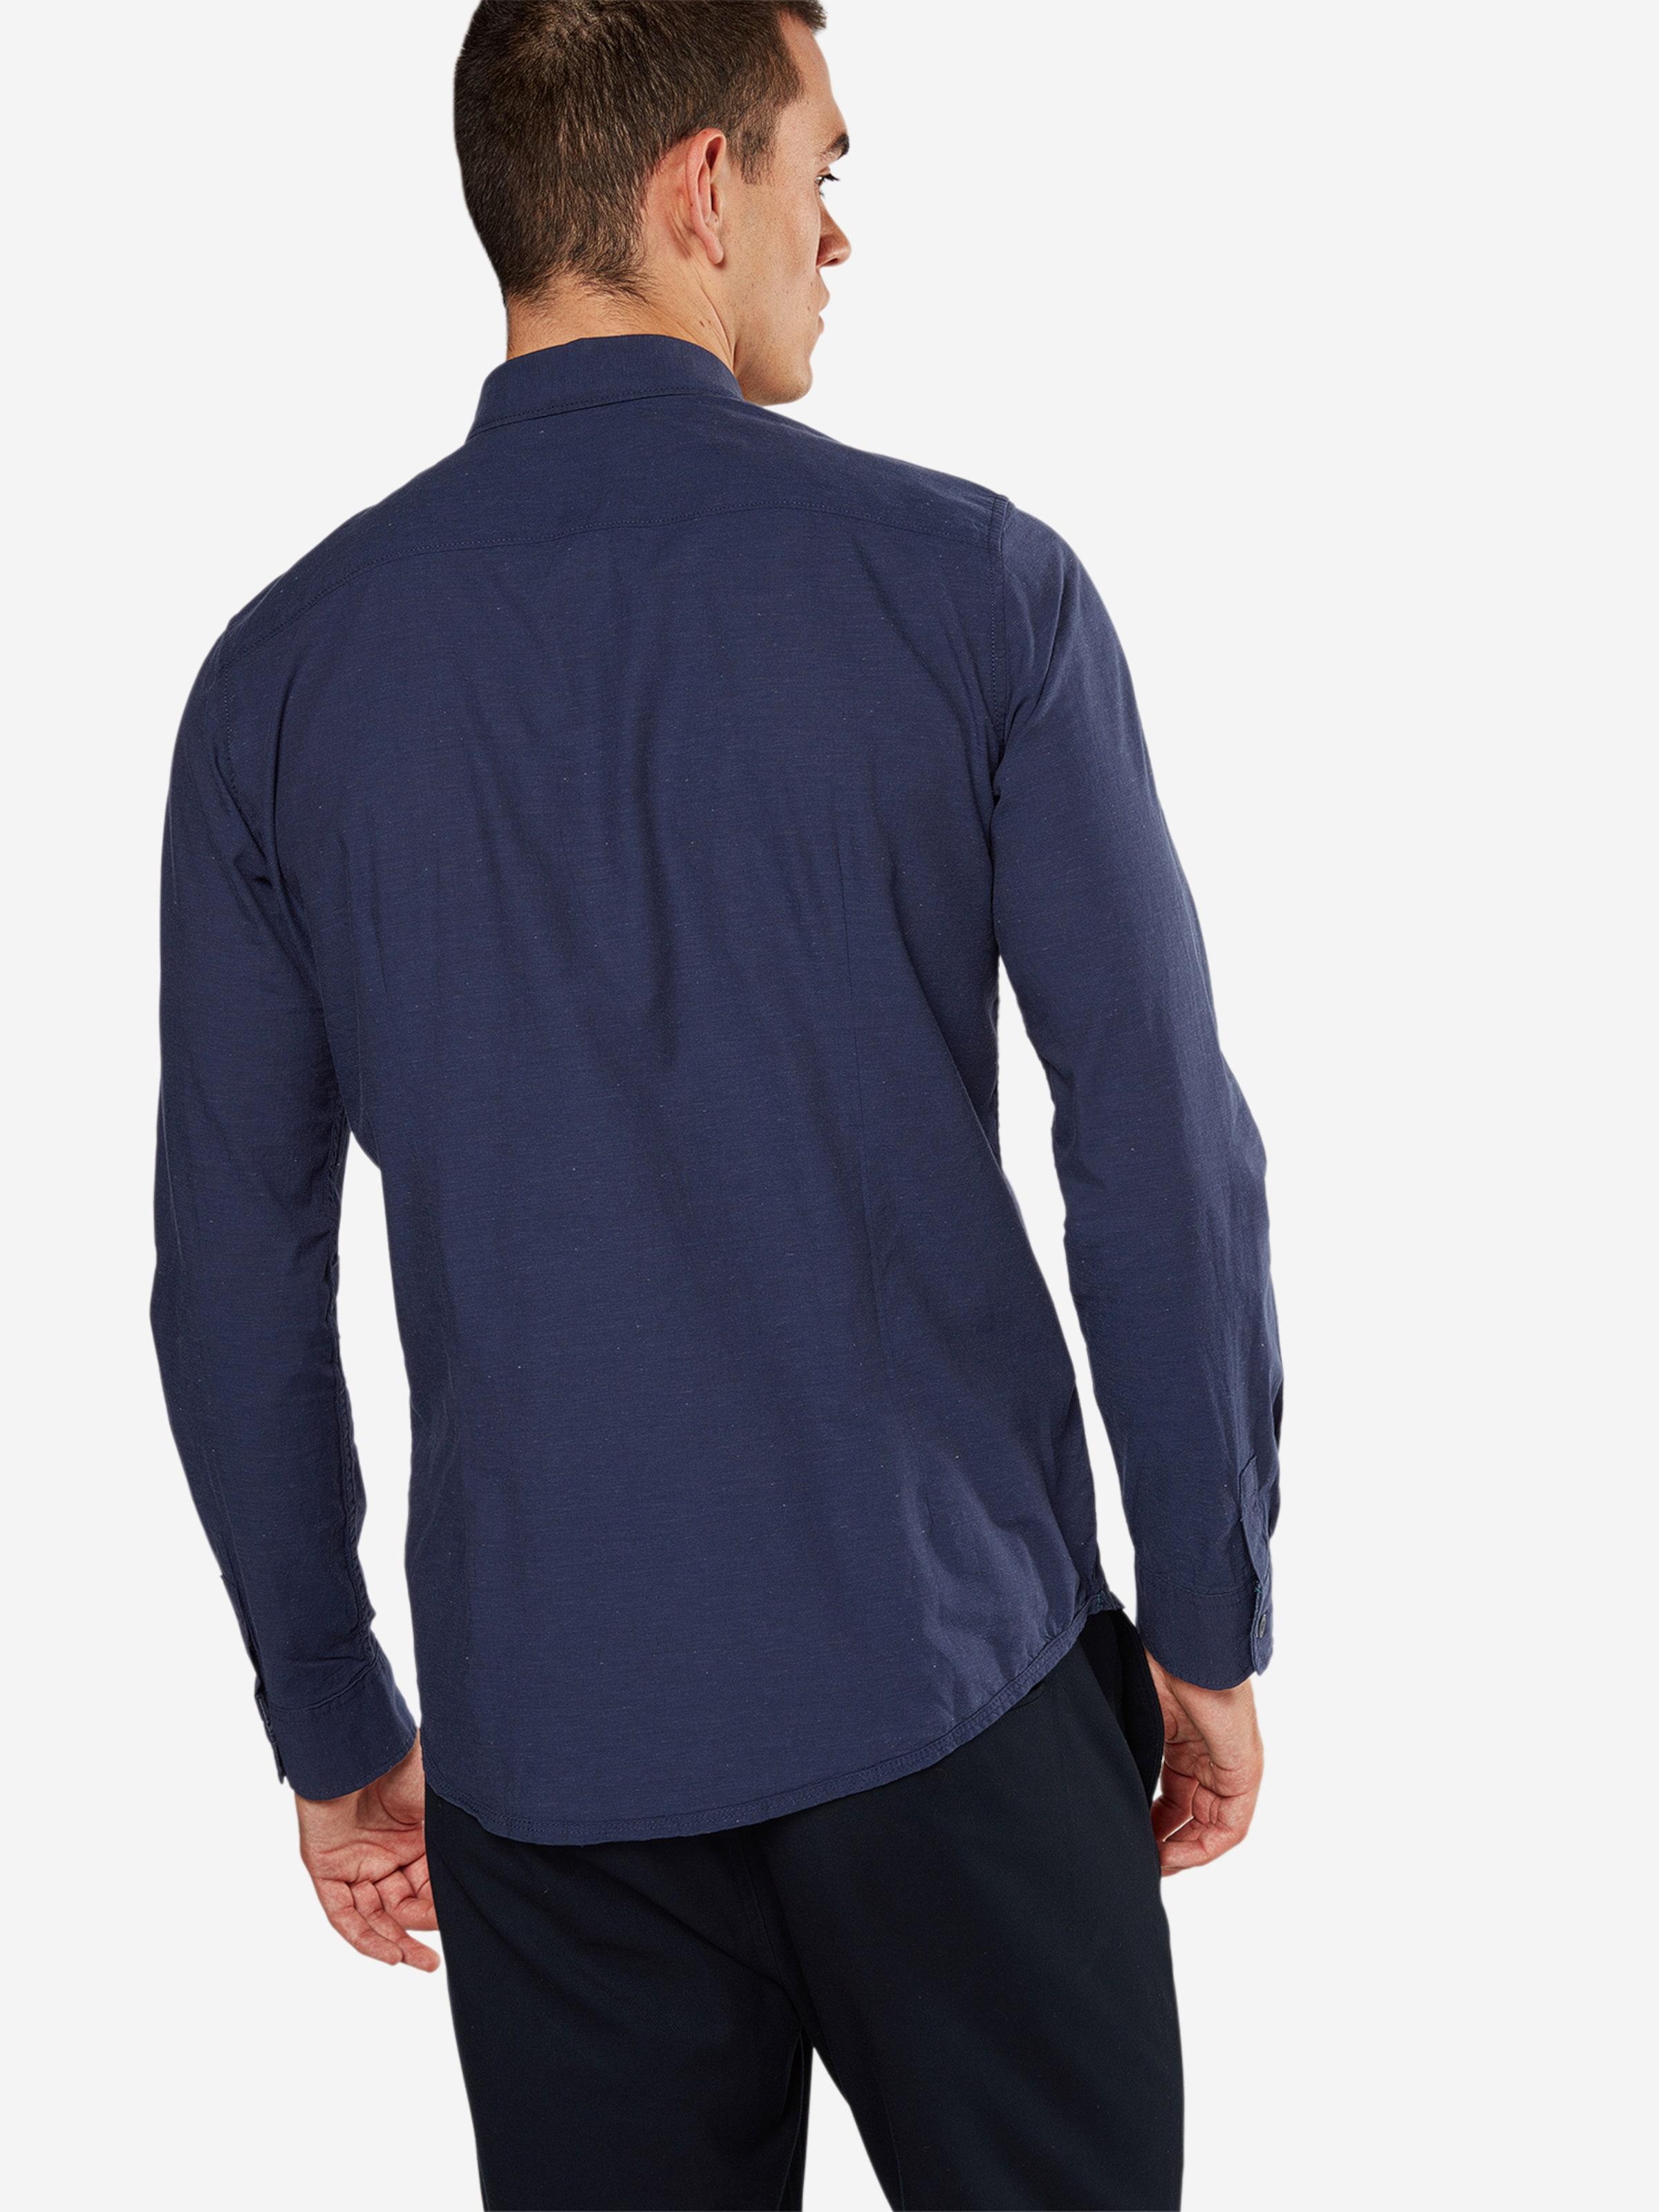 TOM TAILOR Hemd 'Floyd soft melange shirt' Besuchen Neue Spielraum Store Günstiger Preis Auslass Fälschen Auslass Niedriger Preis Gut Verkaufen 0qbTNAiW